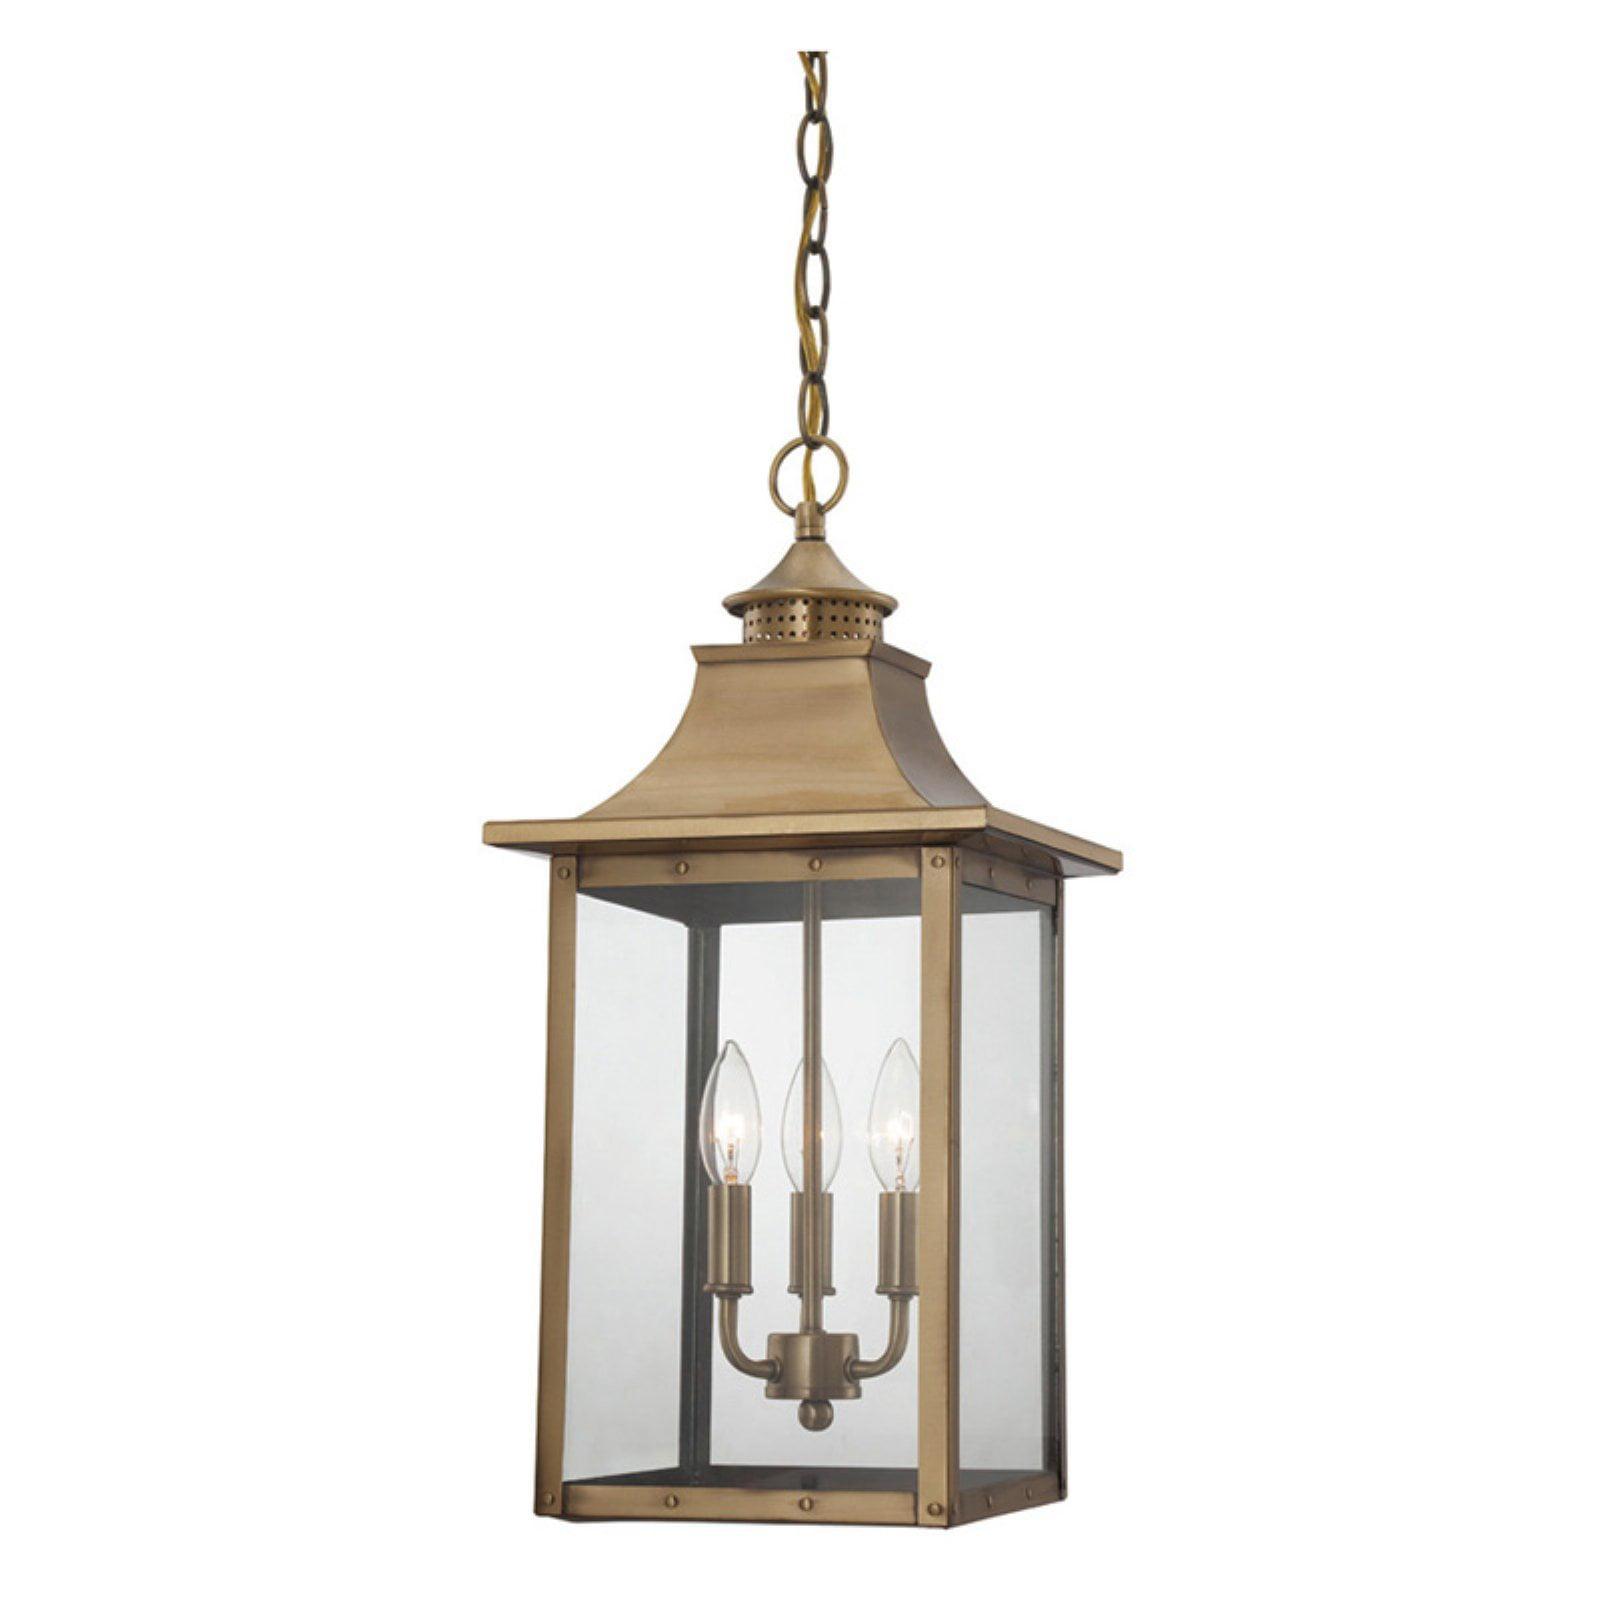 Acclaim Lighting St Charles Outdoor Hanging Lantern Light Fixture by Acclaim Lighting